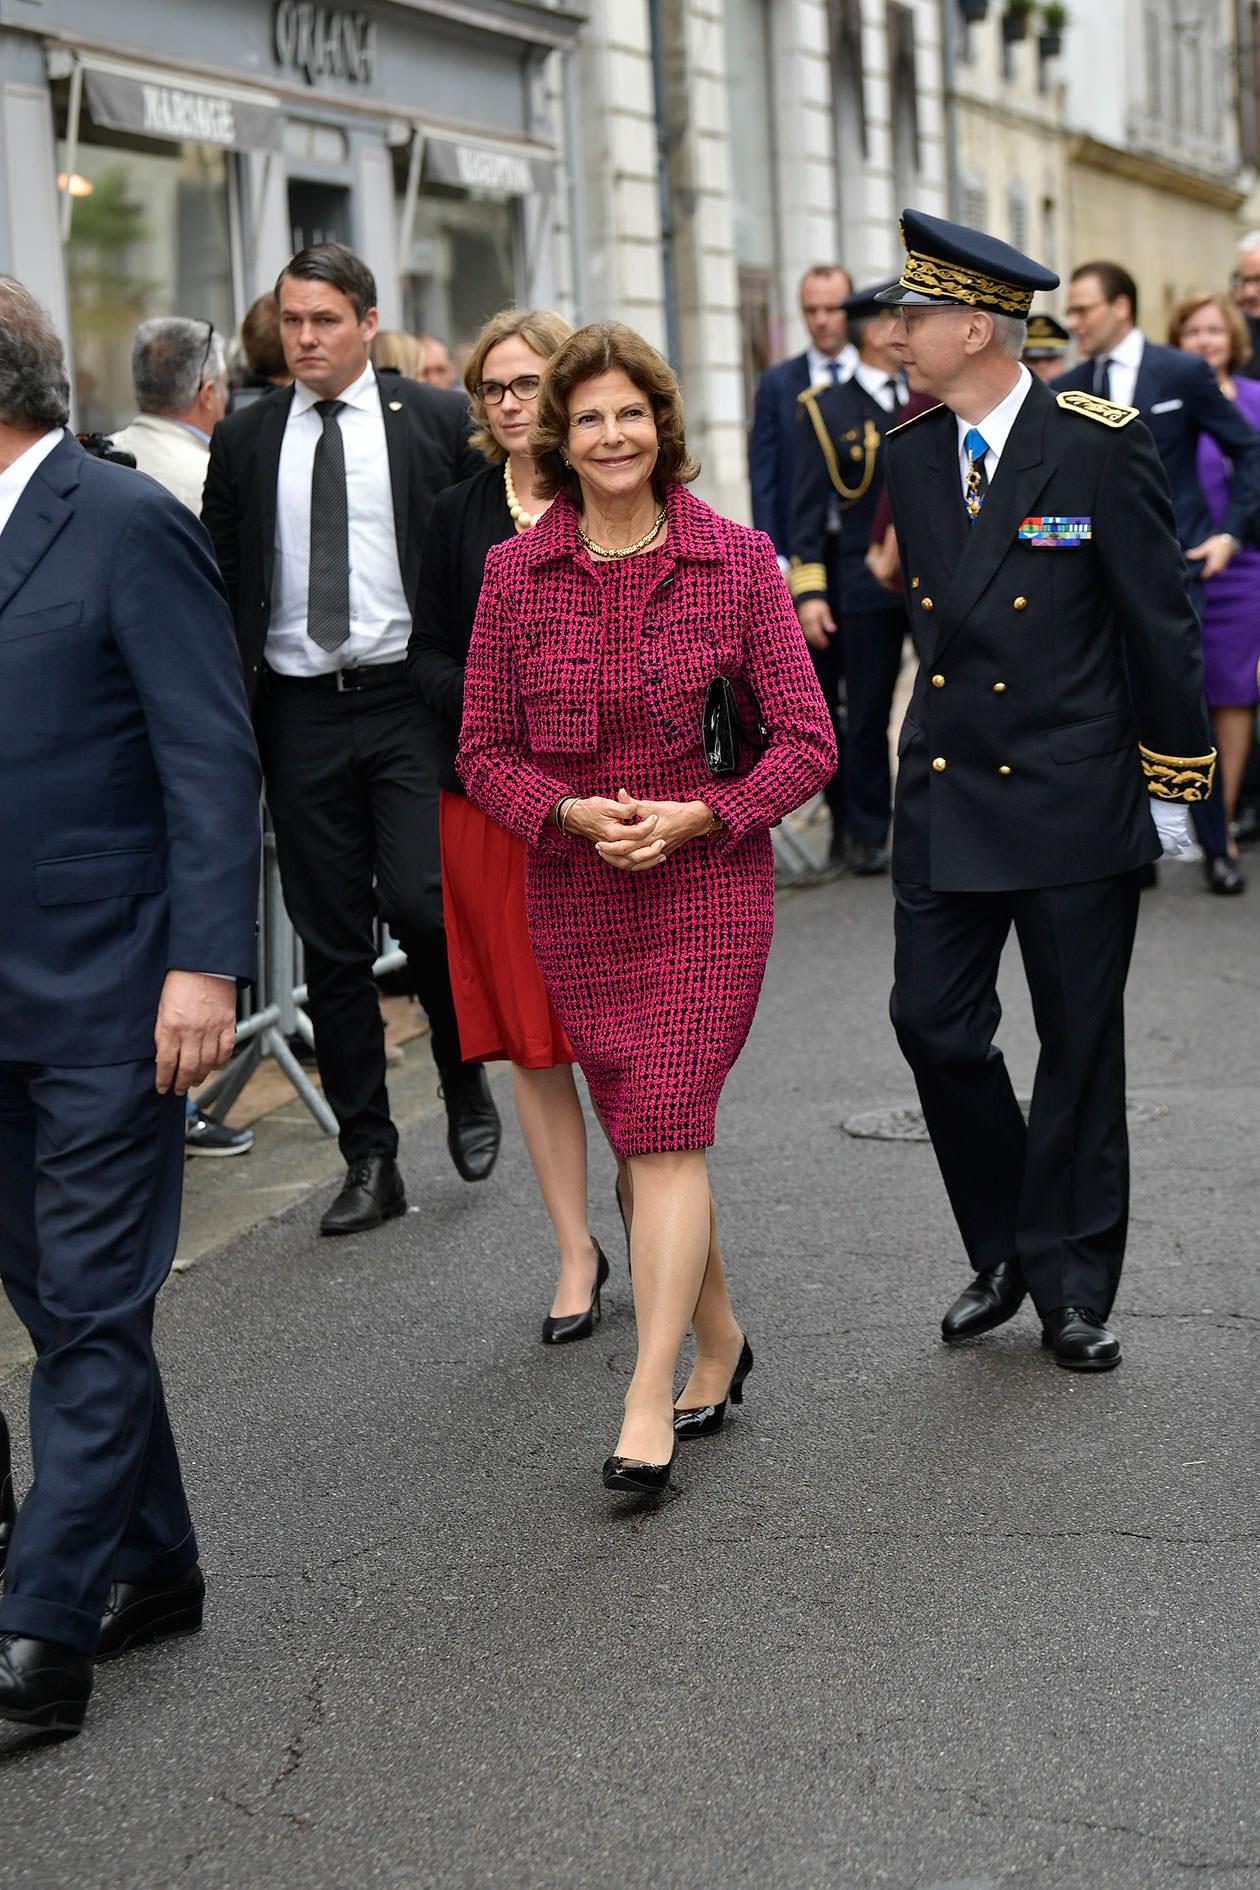 Kungen, drottning Silvia, kronprinsessan Victoria, prins Daniel, Marianne Bernadotte, Pau, Bernadote 200 år